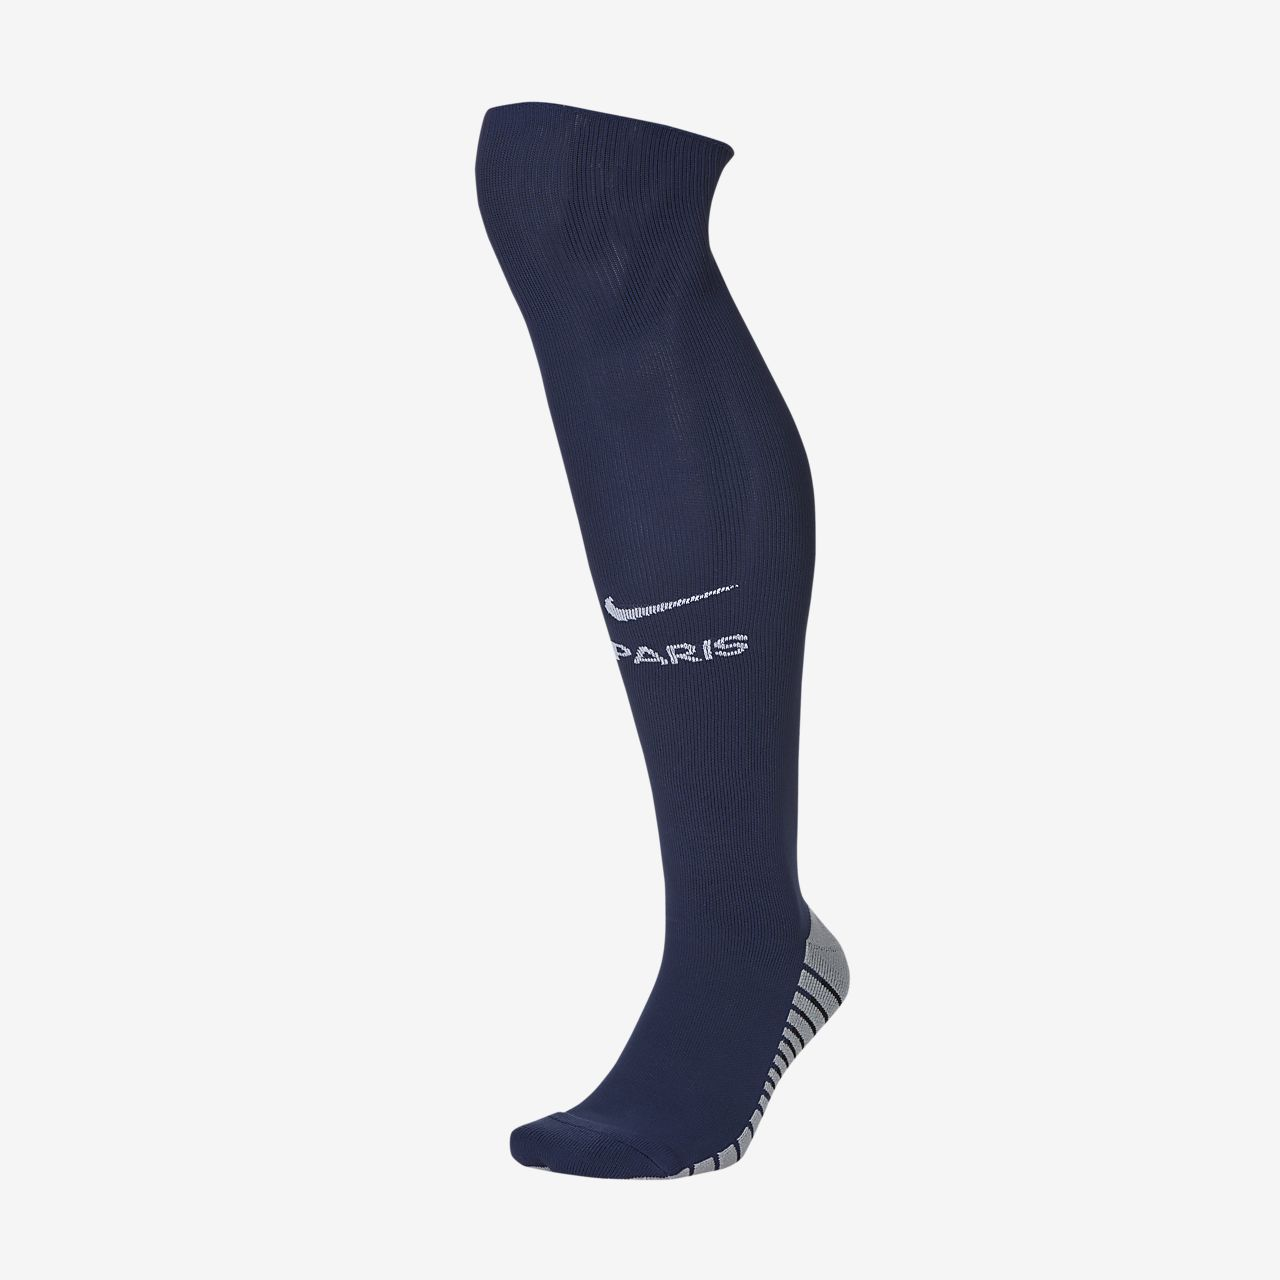 Calcetines de fútbol hasta la rodilla de local Paris Saint-Germain 2019/20 Stadium